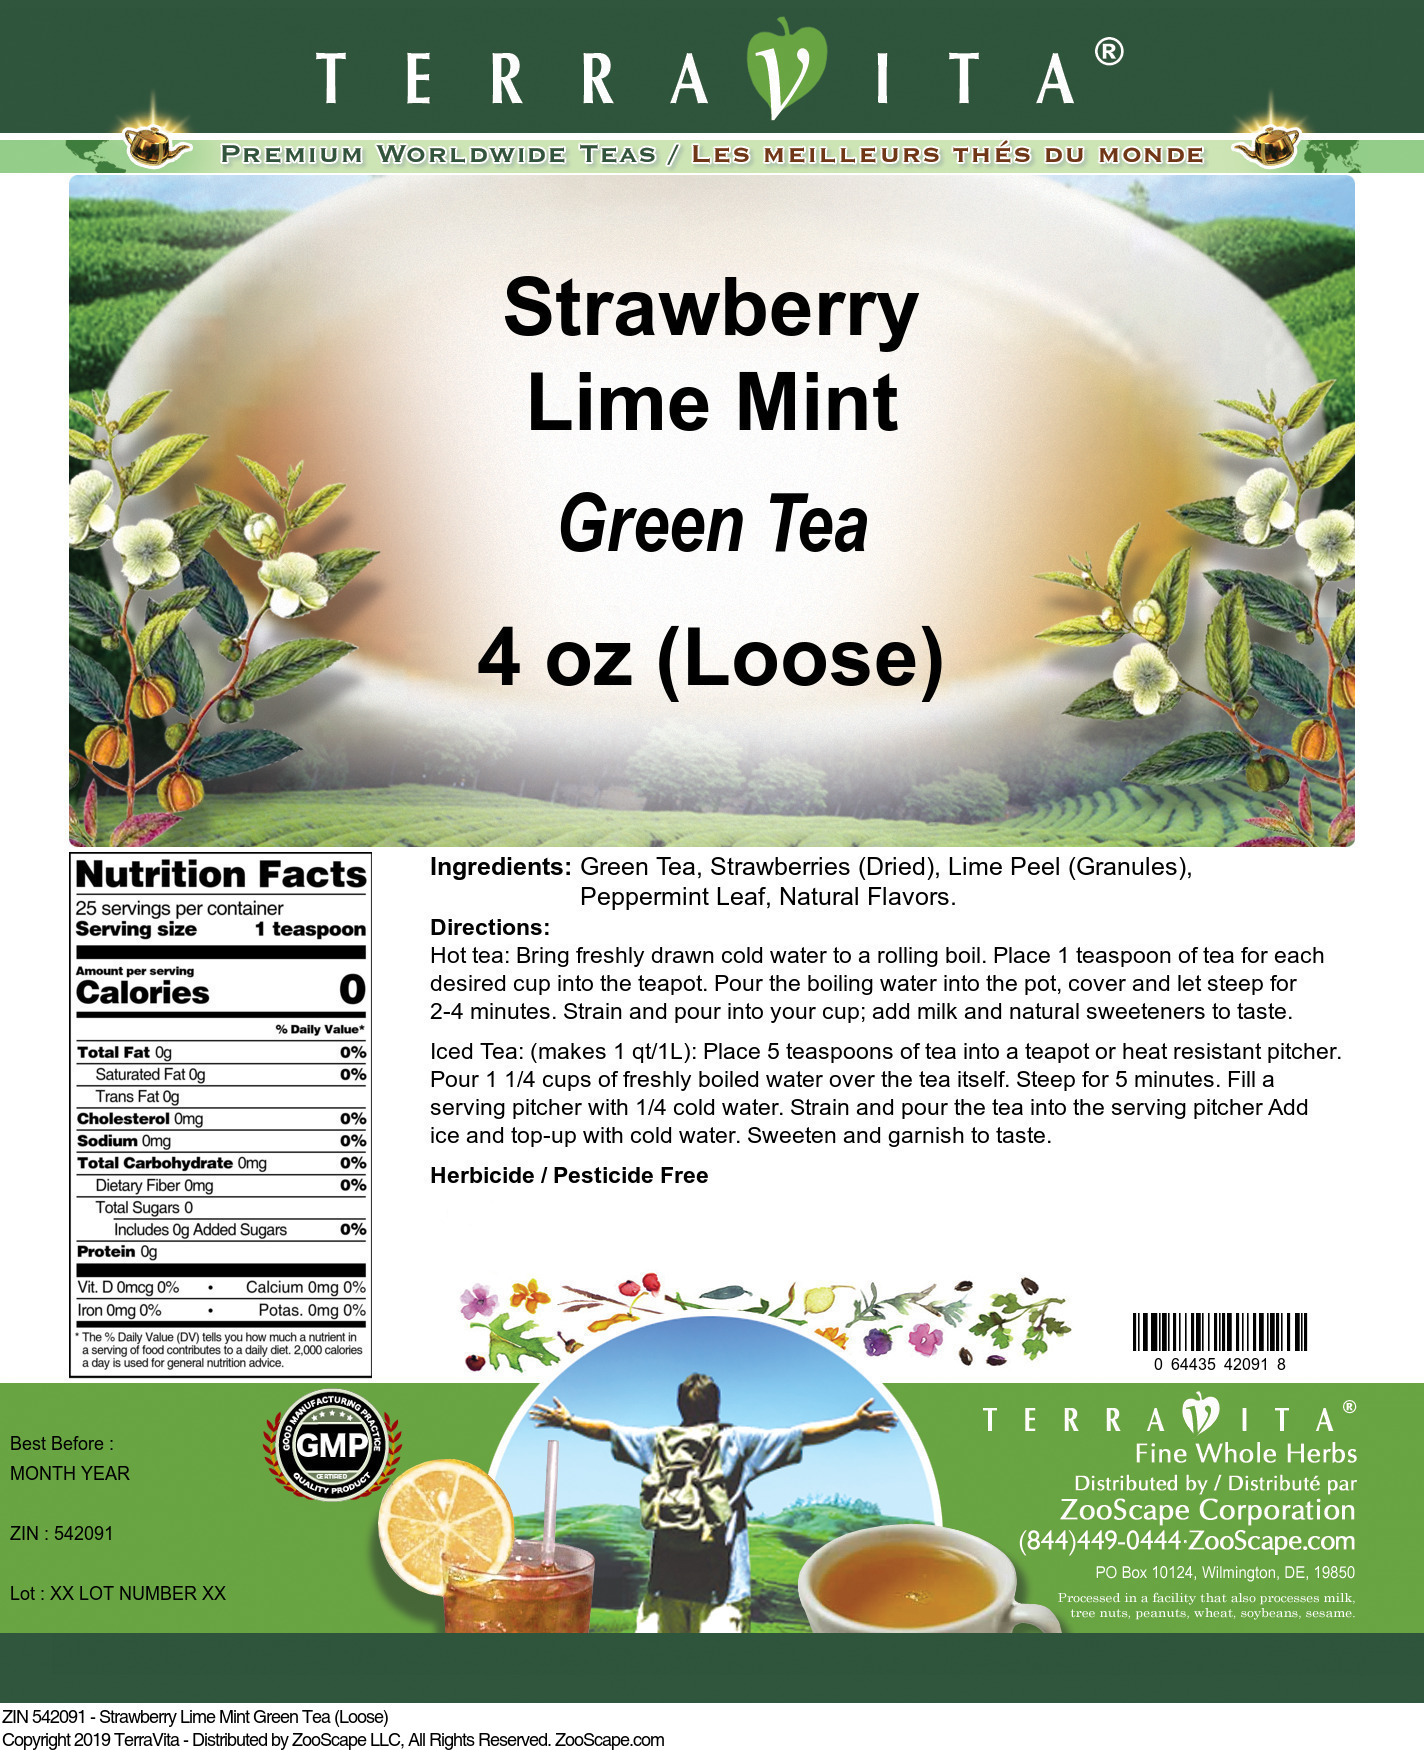 Strawberry Lime Mint Green Tea